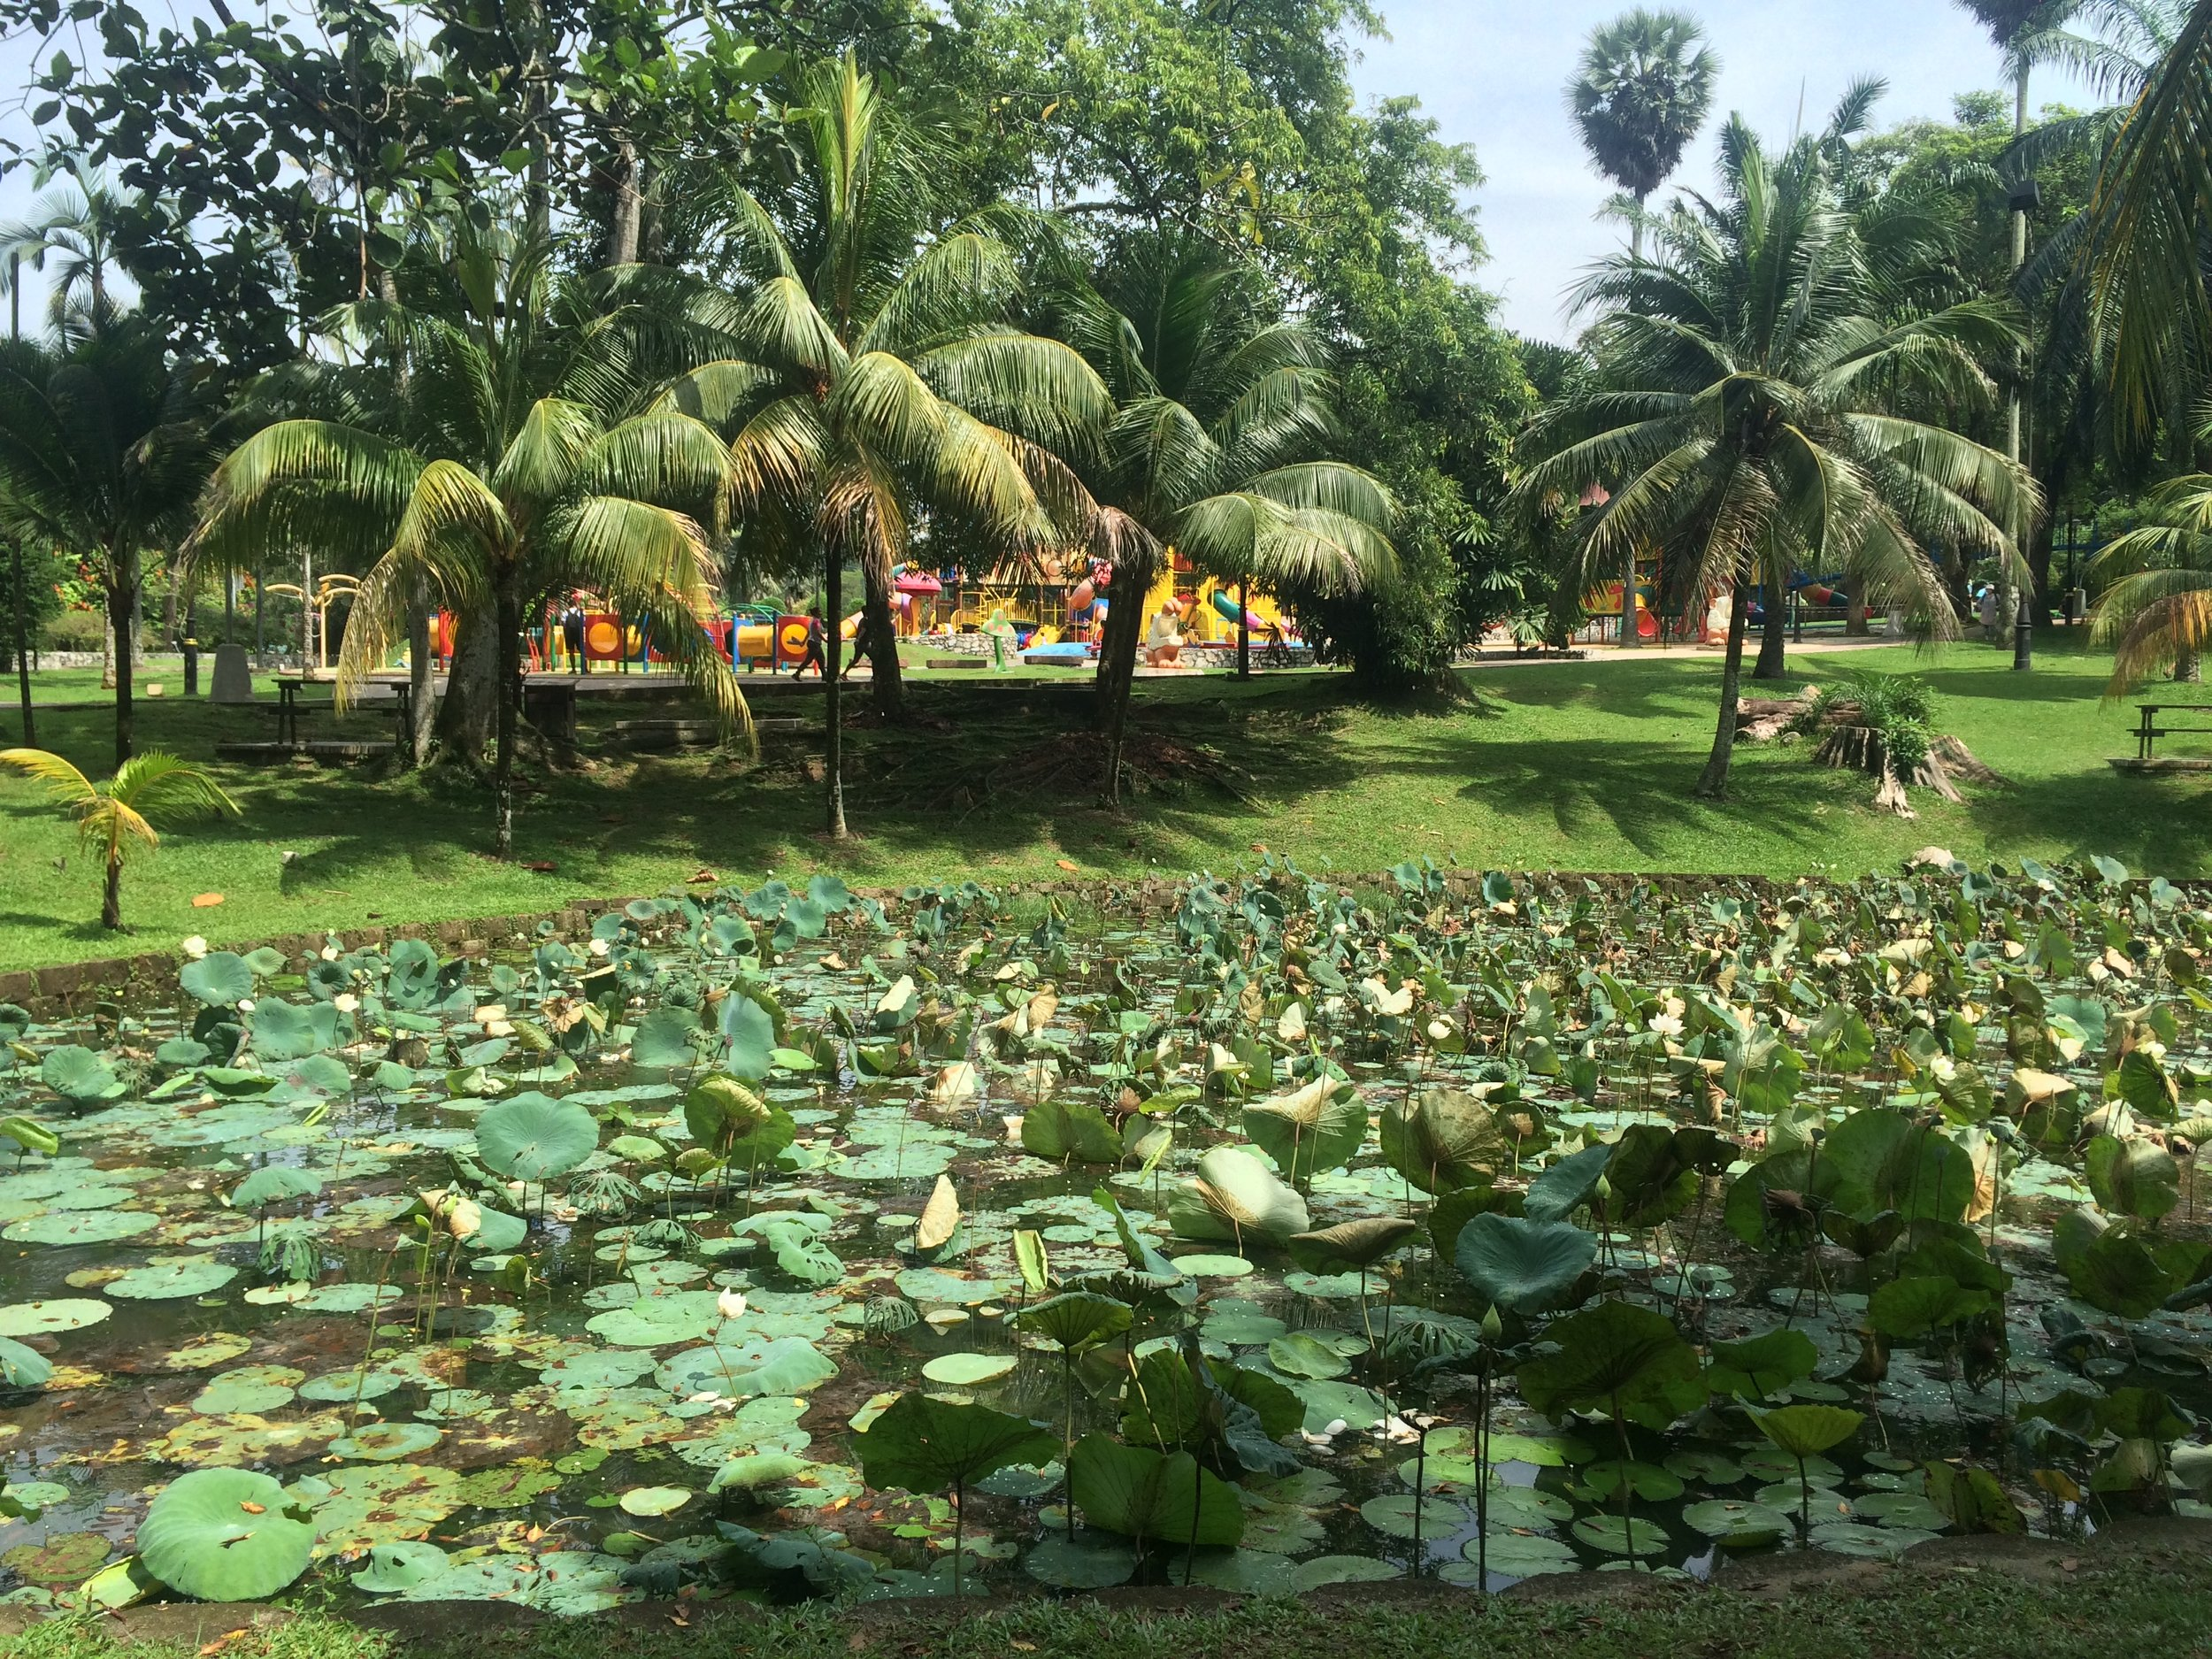 The White Lotus Pond, Perdana Botanical Gardens, Kuala Lumpur (Note the Children's playground in the background)